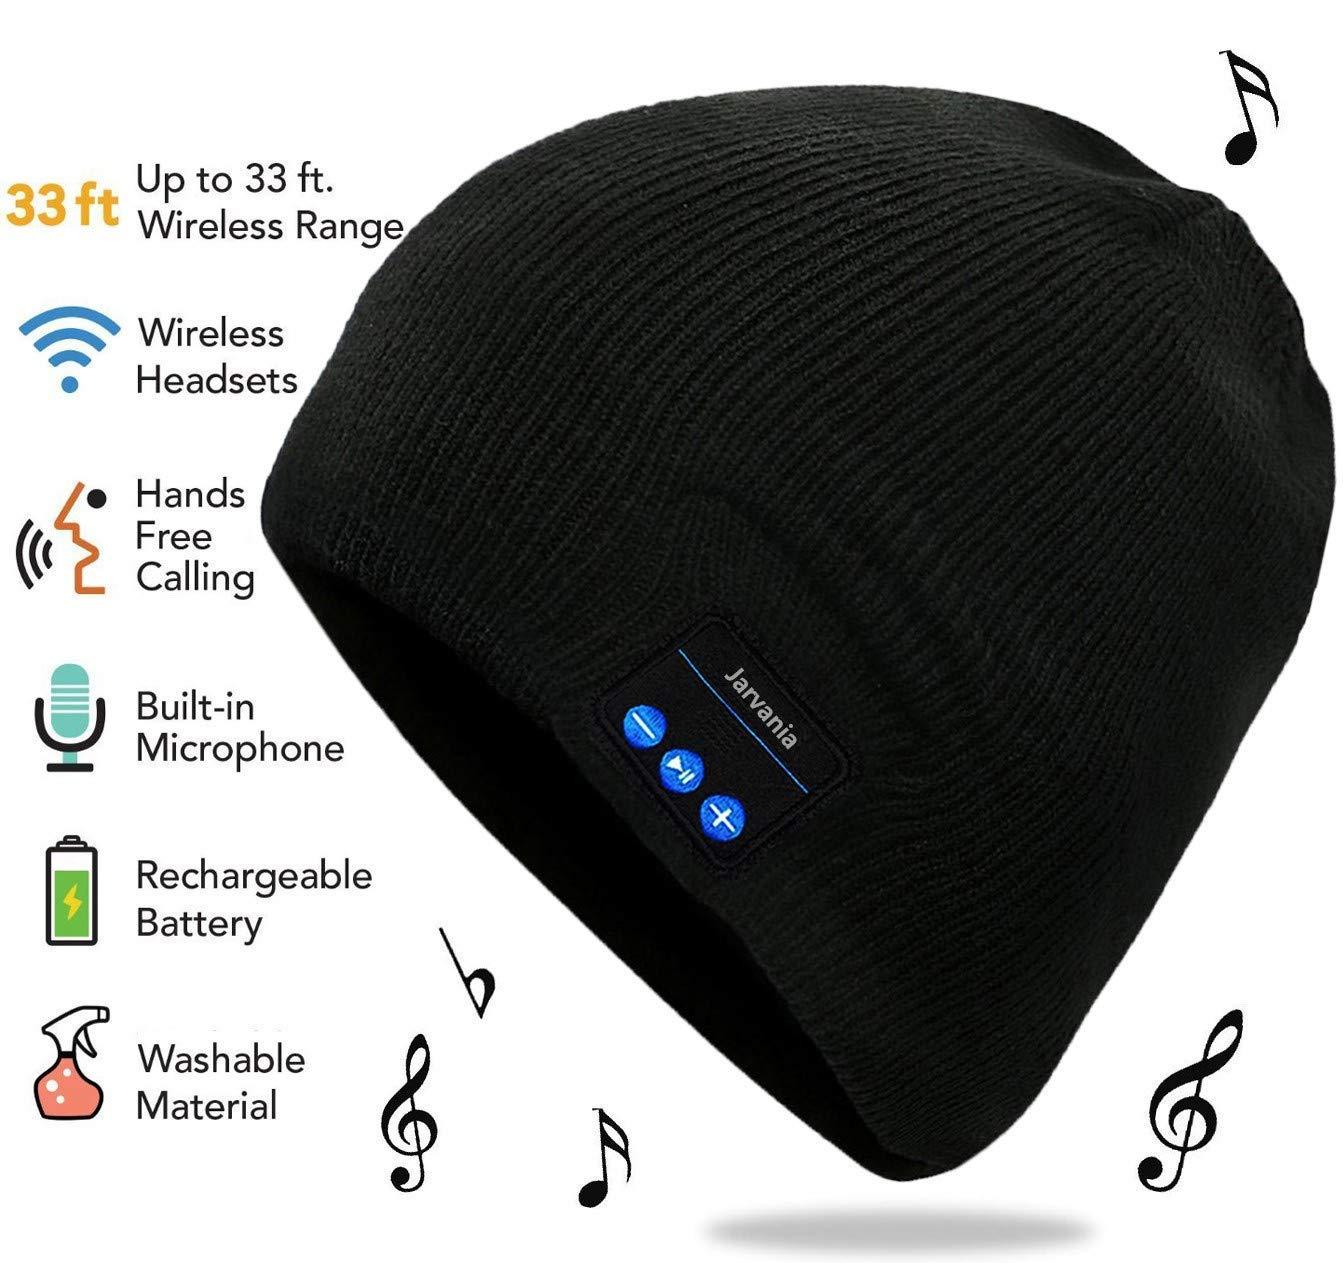 Bluetooth Beanie Hat, Wireless Headphone Beanie, Winter Knitting Beanie Cap Bluetooth Earphones, Built-in Microphone Hand-Free Calling, Gifts Both Women Men (Black)